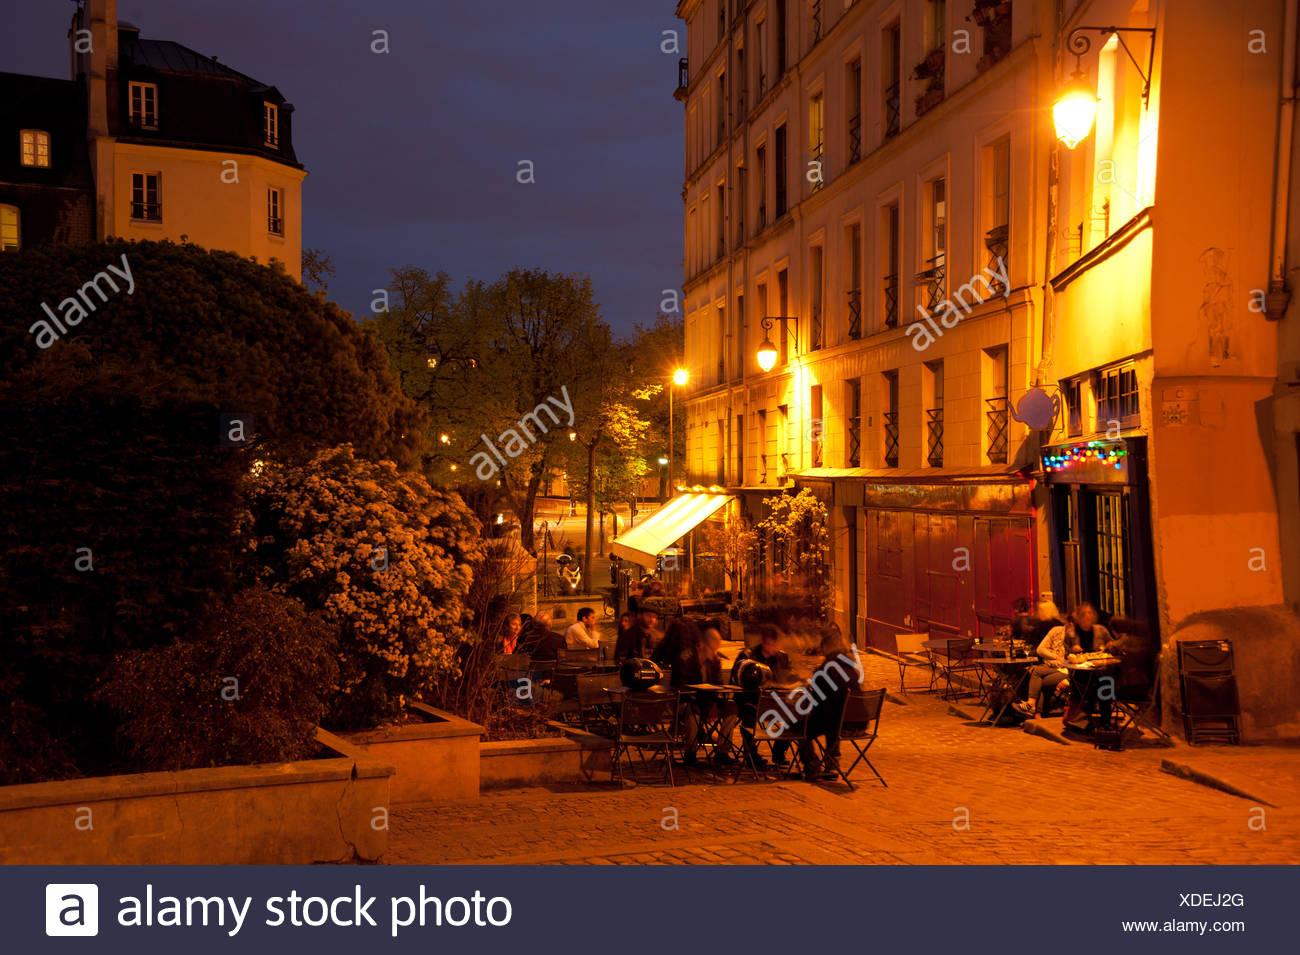 Abend in Paris - Stock Image